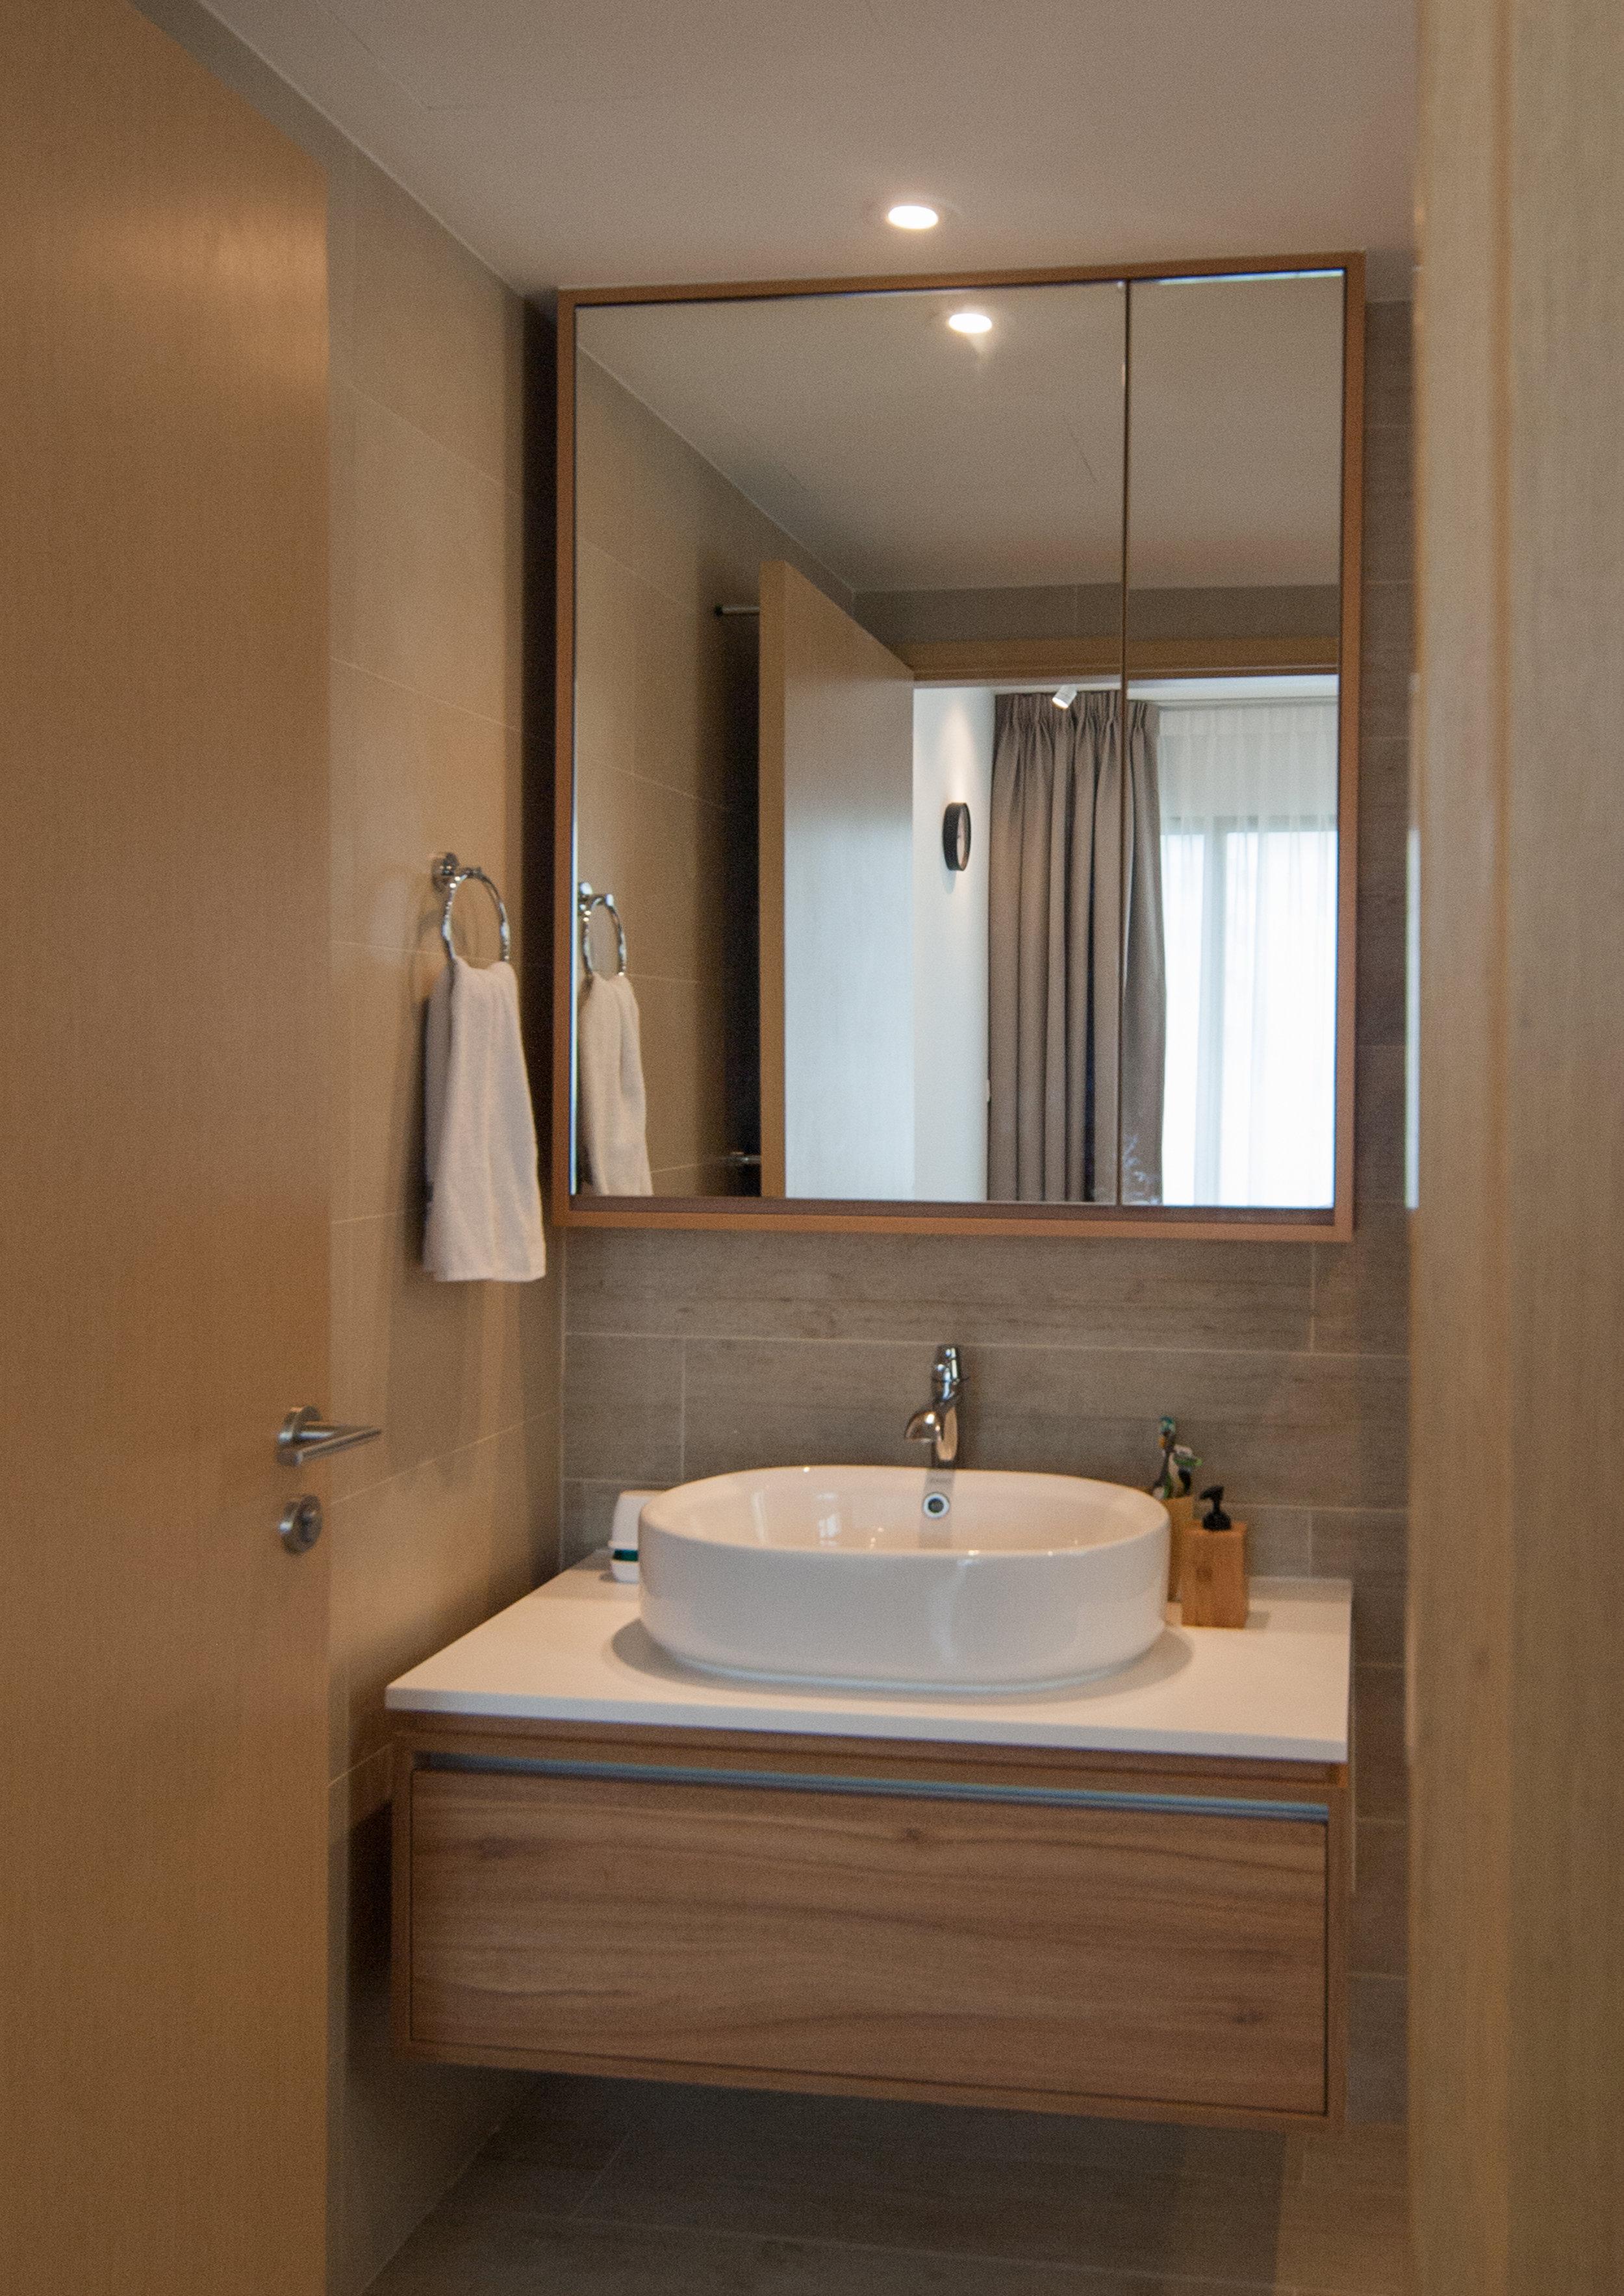 Mirror cabinet in the bathroom.